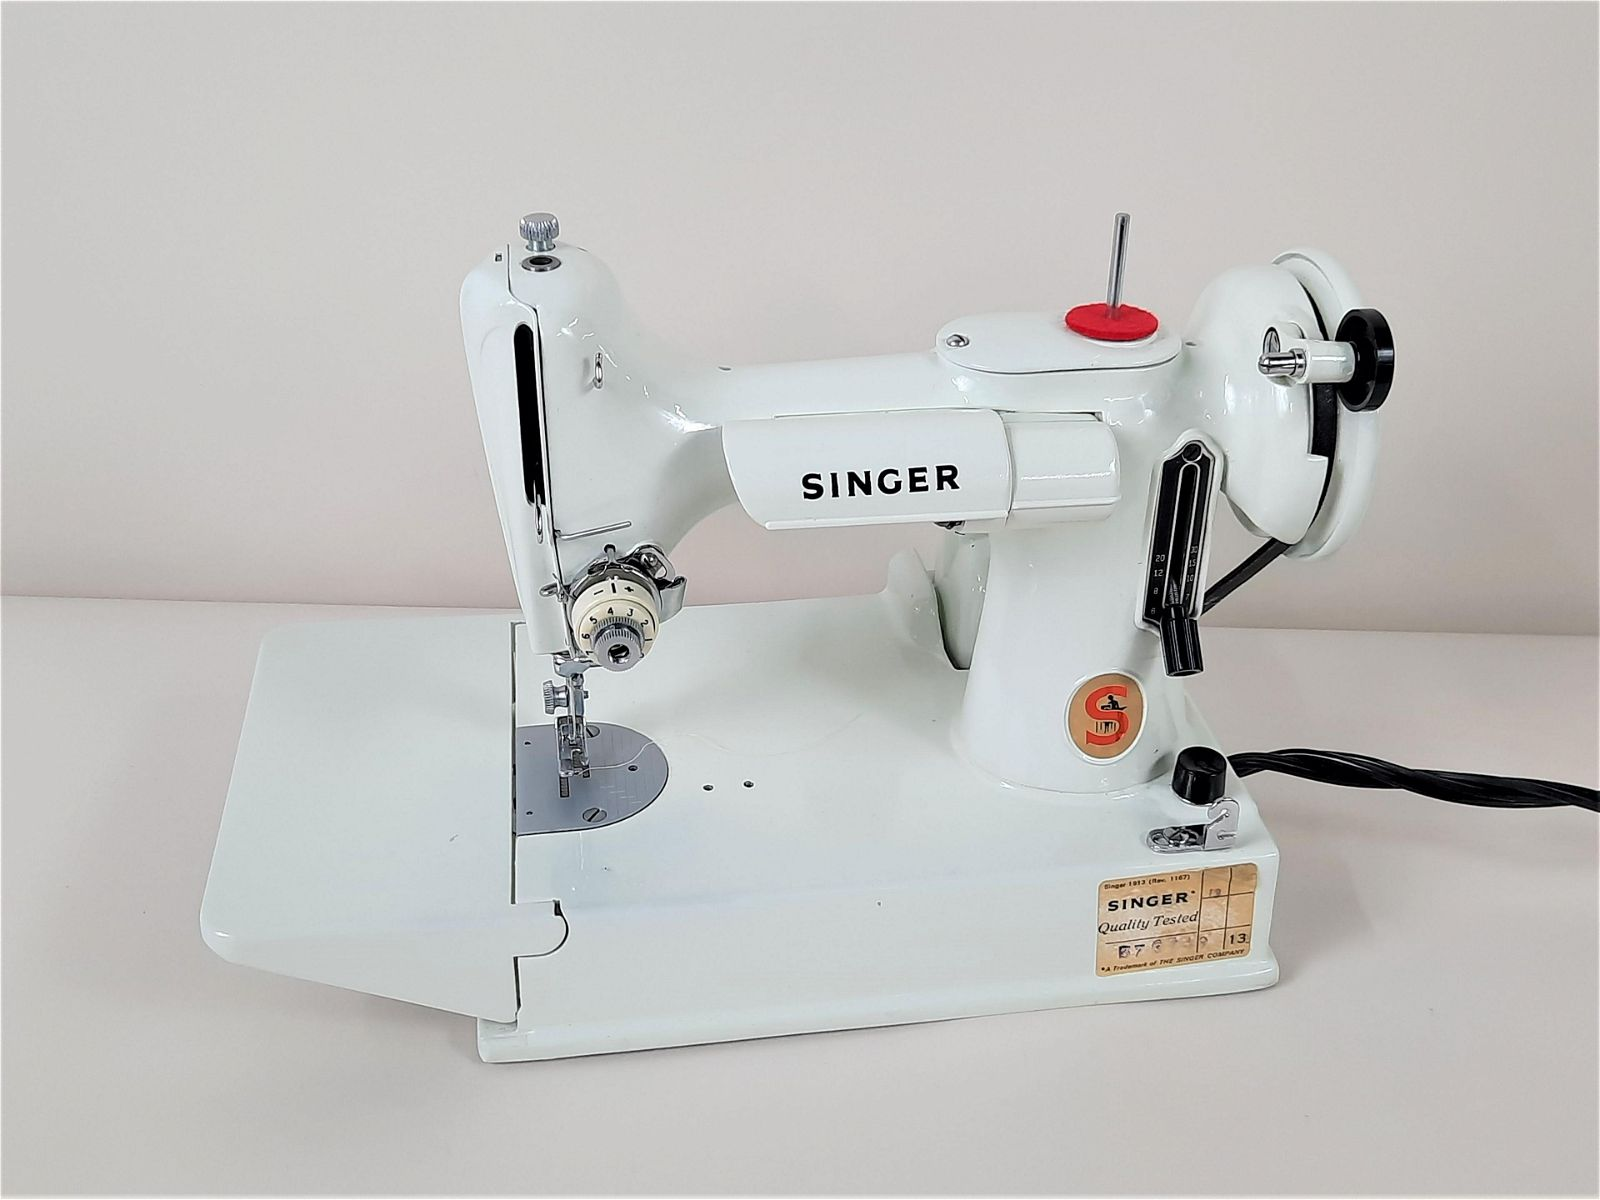 Singer Featherweight Sewing Machine w/ Attachments